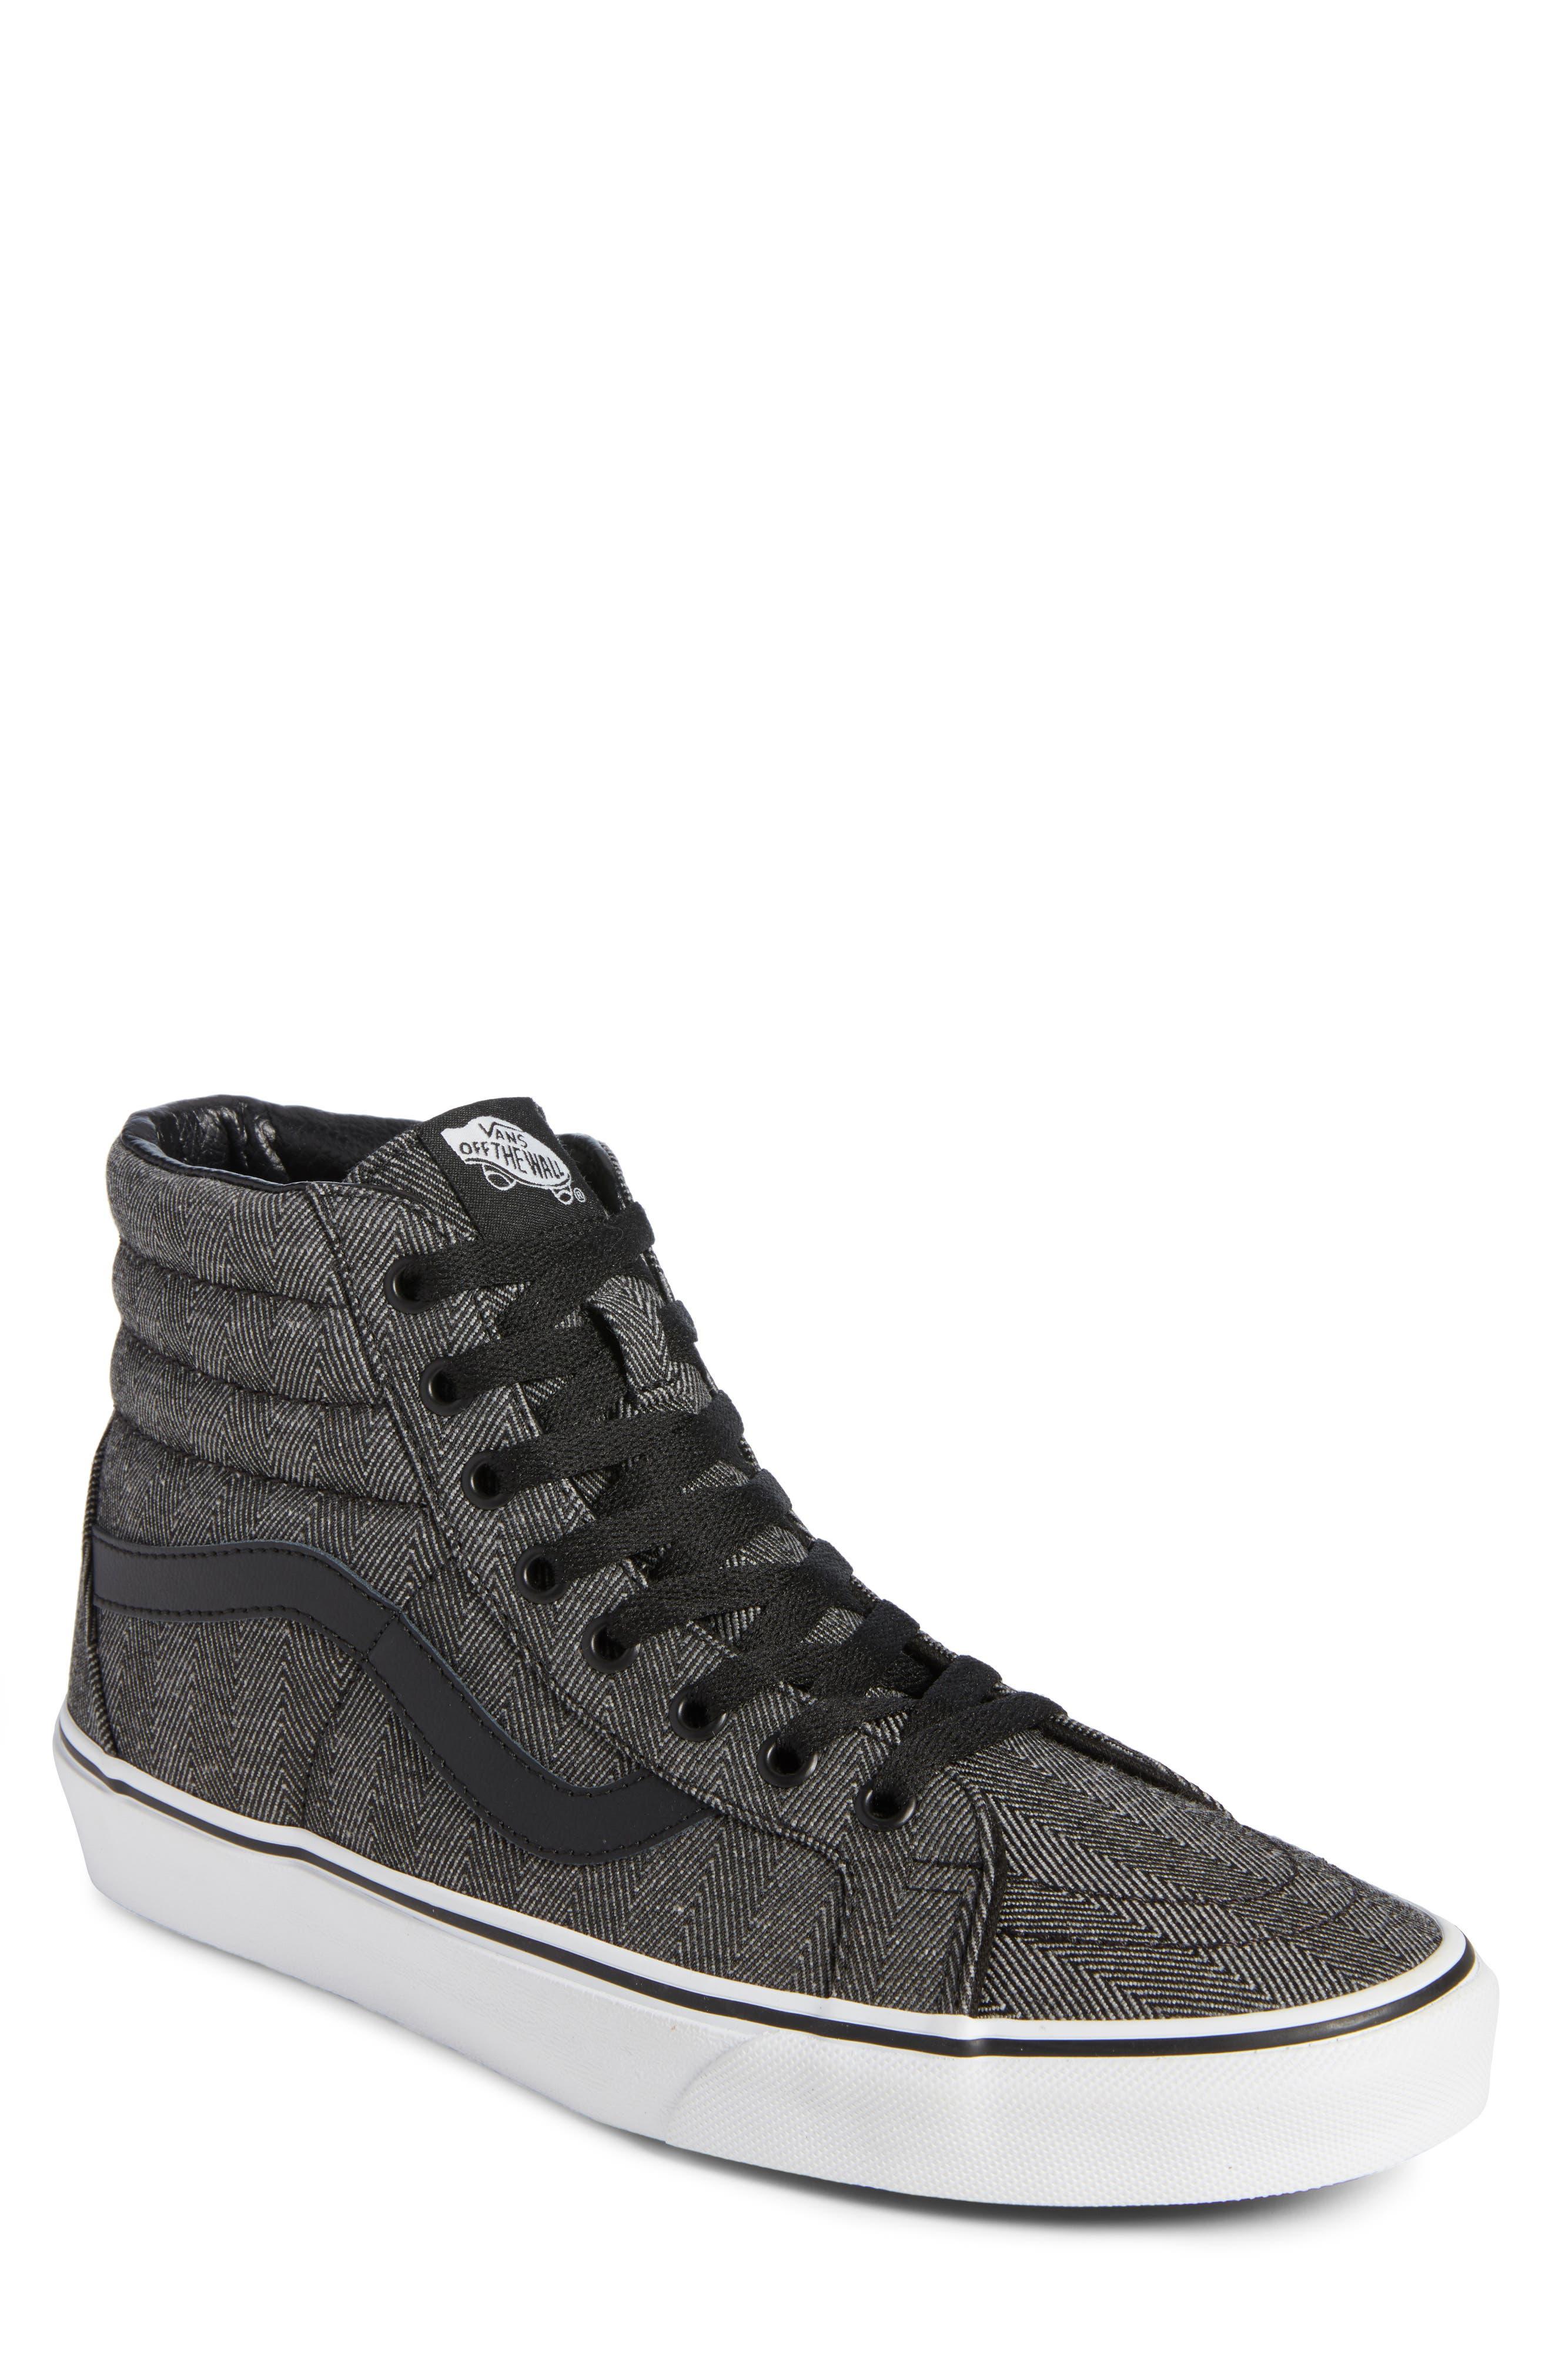 SK8-Hi Reissue High Top Sneaker,                             Main thumbnail 1, color,                             BLACK/ TRUE WHITE